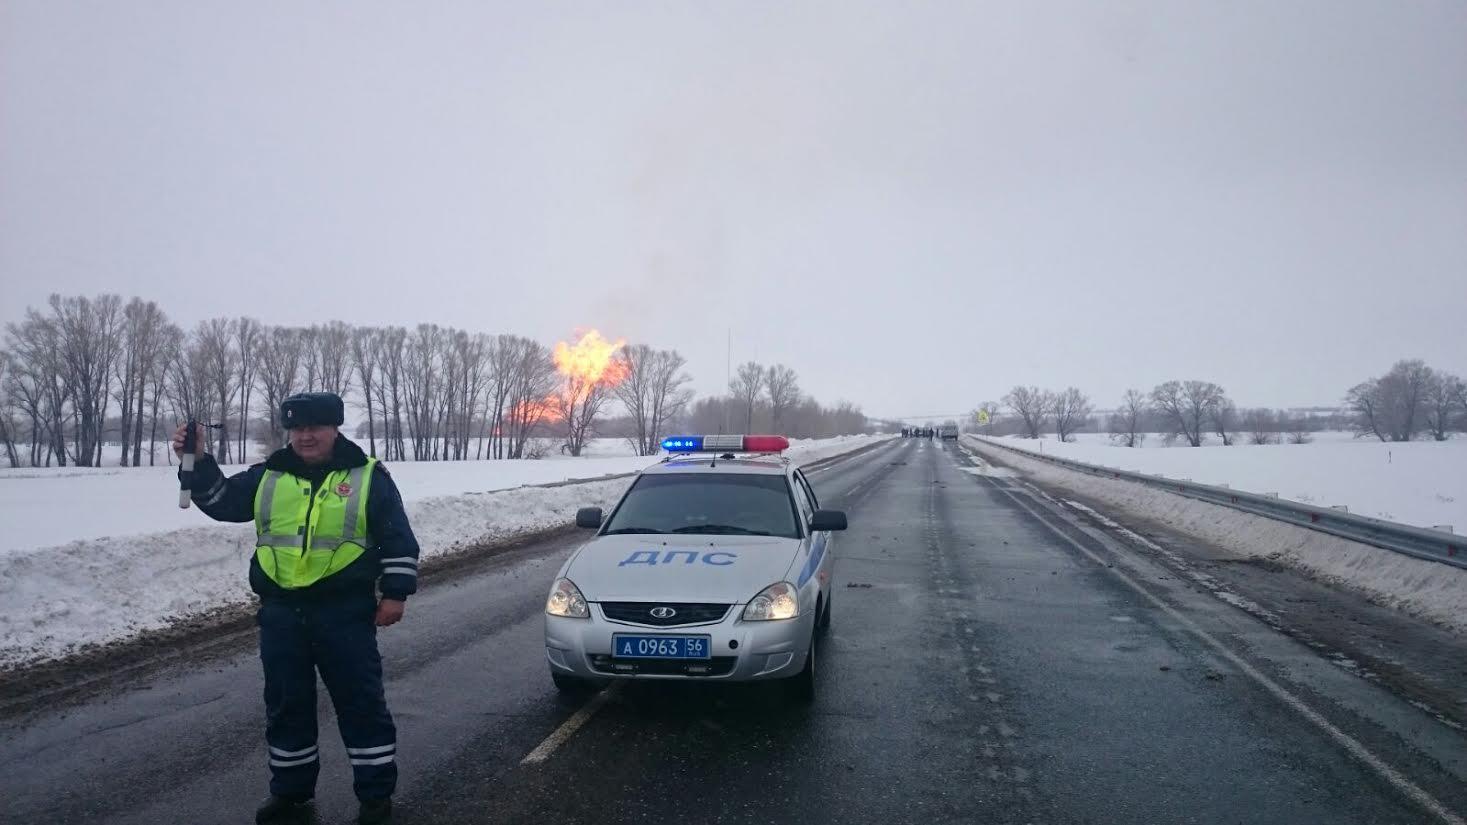 Пост ДПС на месте взрыва газопровода. Фото: УГИБДД УМВД РФ по Оренбургской области